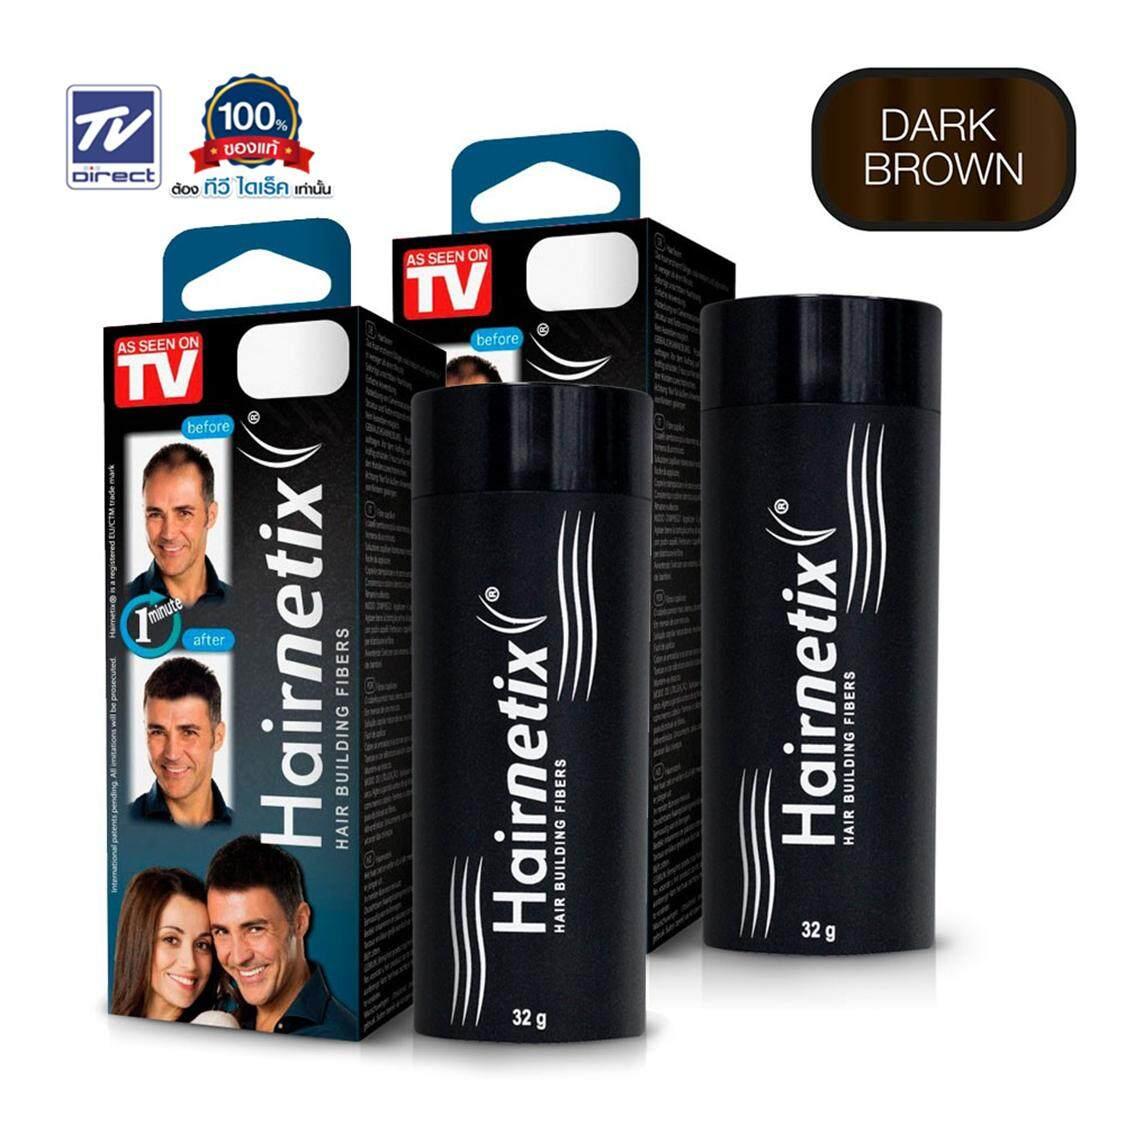 TVDirect ผงไฟเบอร์ปิดผมบาง HAIRNETIX DARK BROWNสีน้ำตาลเข้ม ซื้อ 1 แถม 1